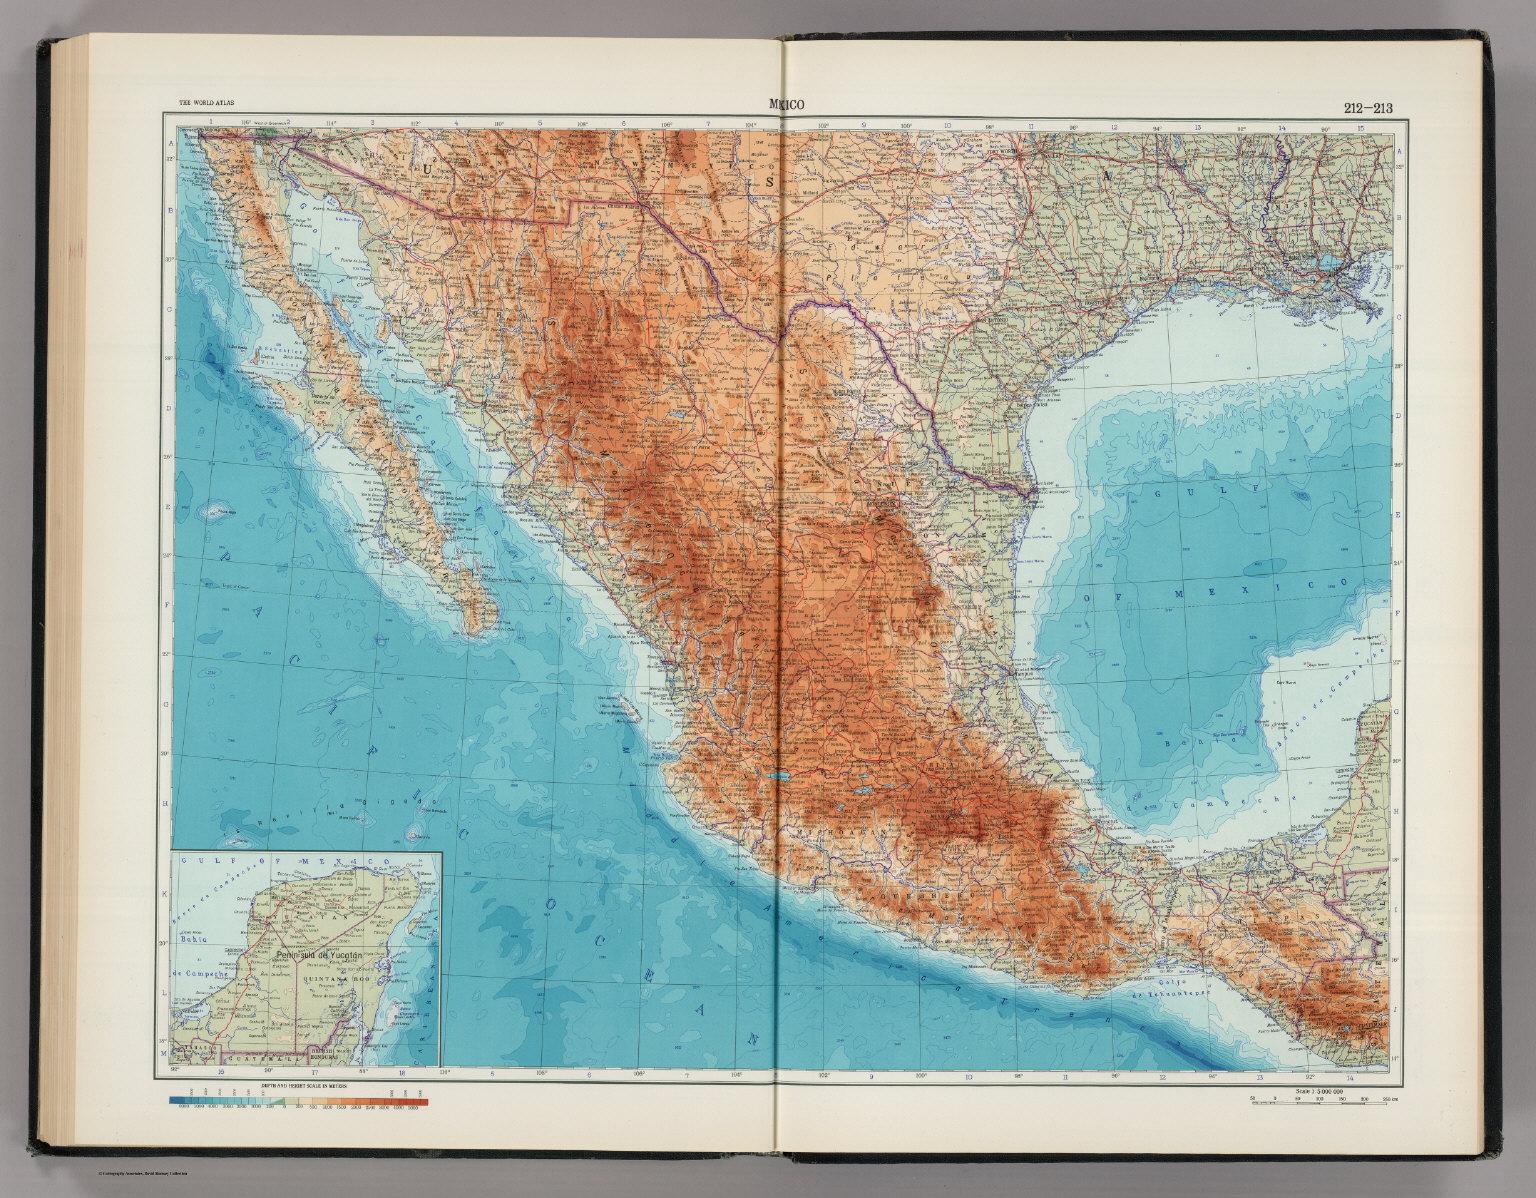 212 213 mexico the world atlas david rumsey historical map mexico the world atlas gumiabroncs Choice Image